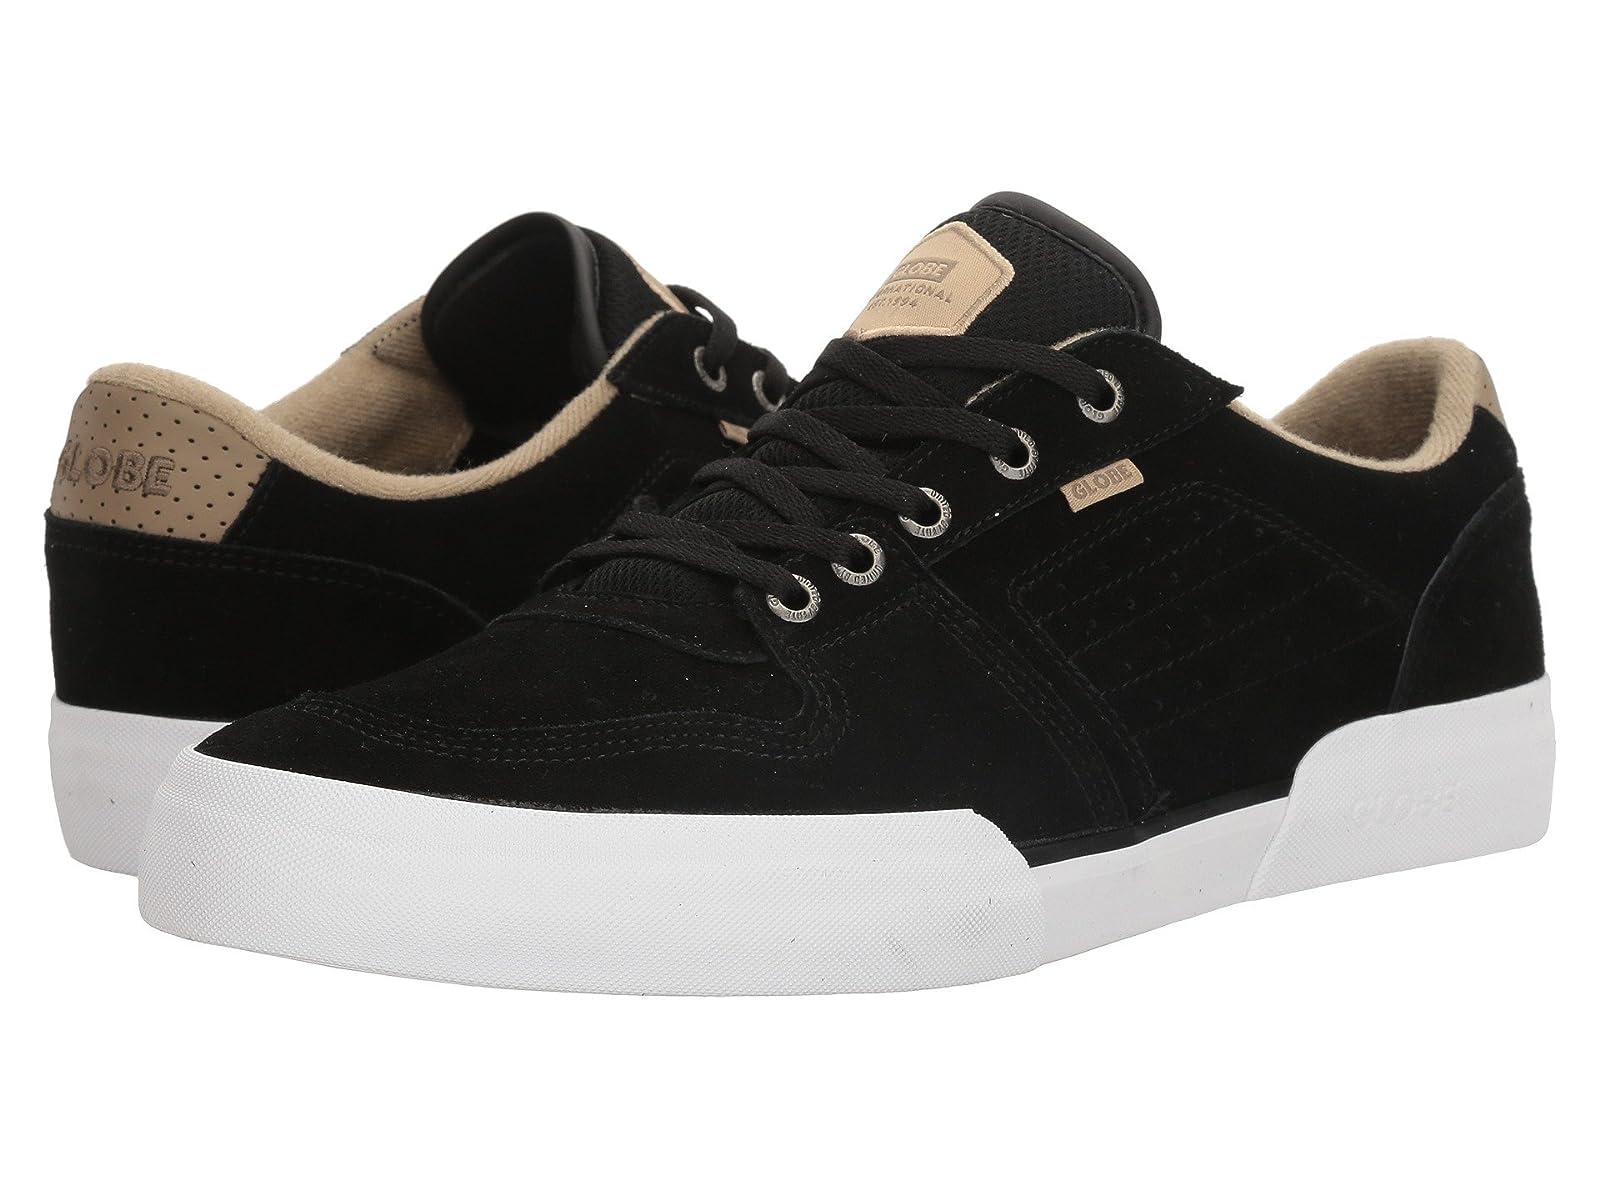 Globe Mojo LegacyCheap and distinctive eye-catching shoes